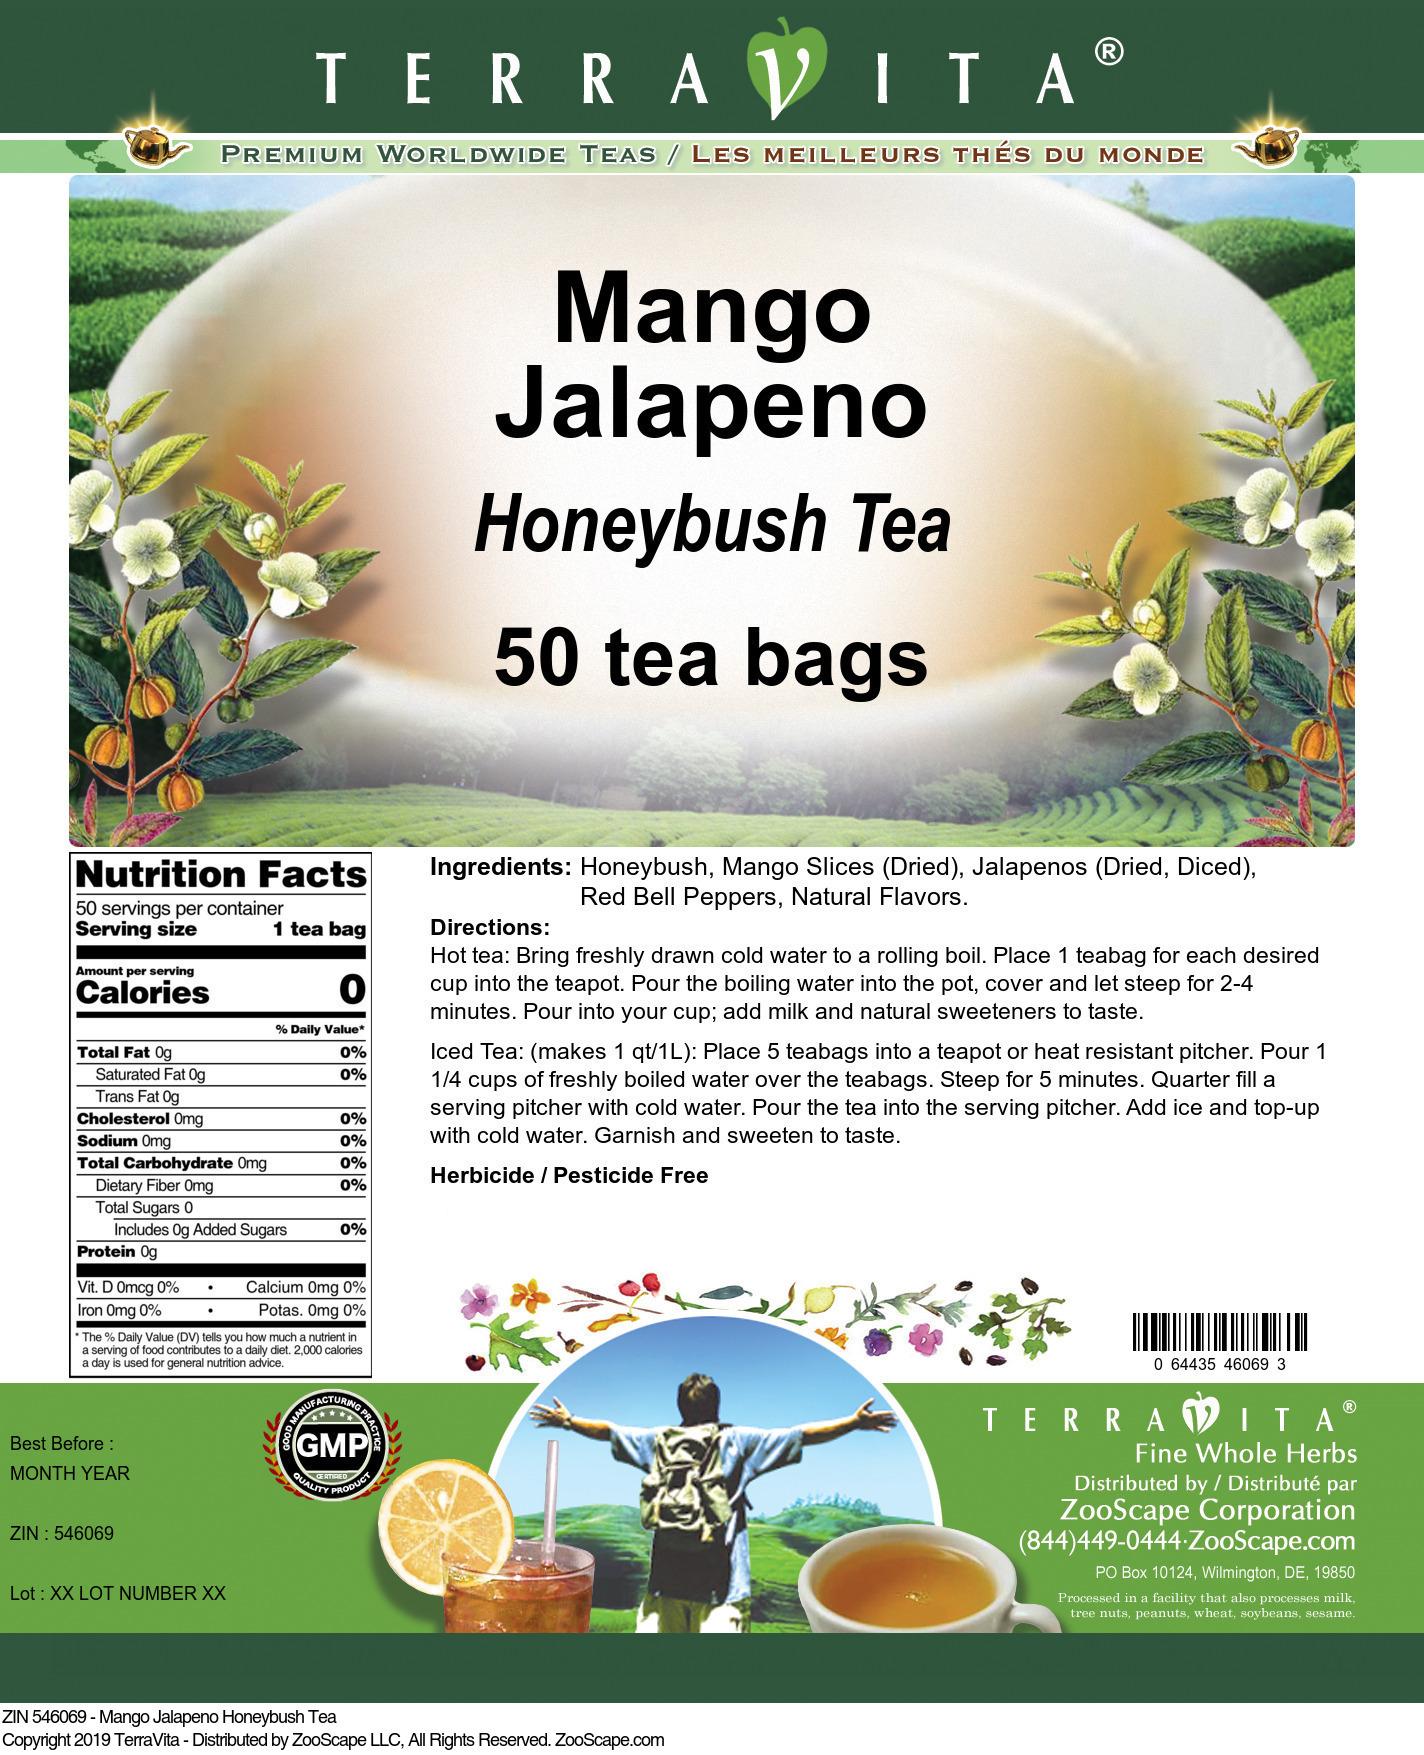 Mango Jalapeno Honeybush Tea